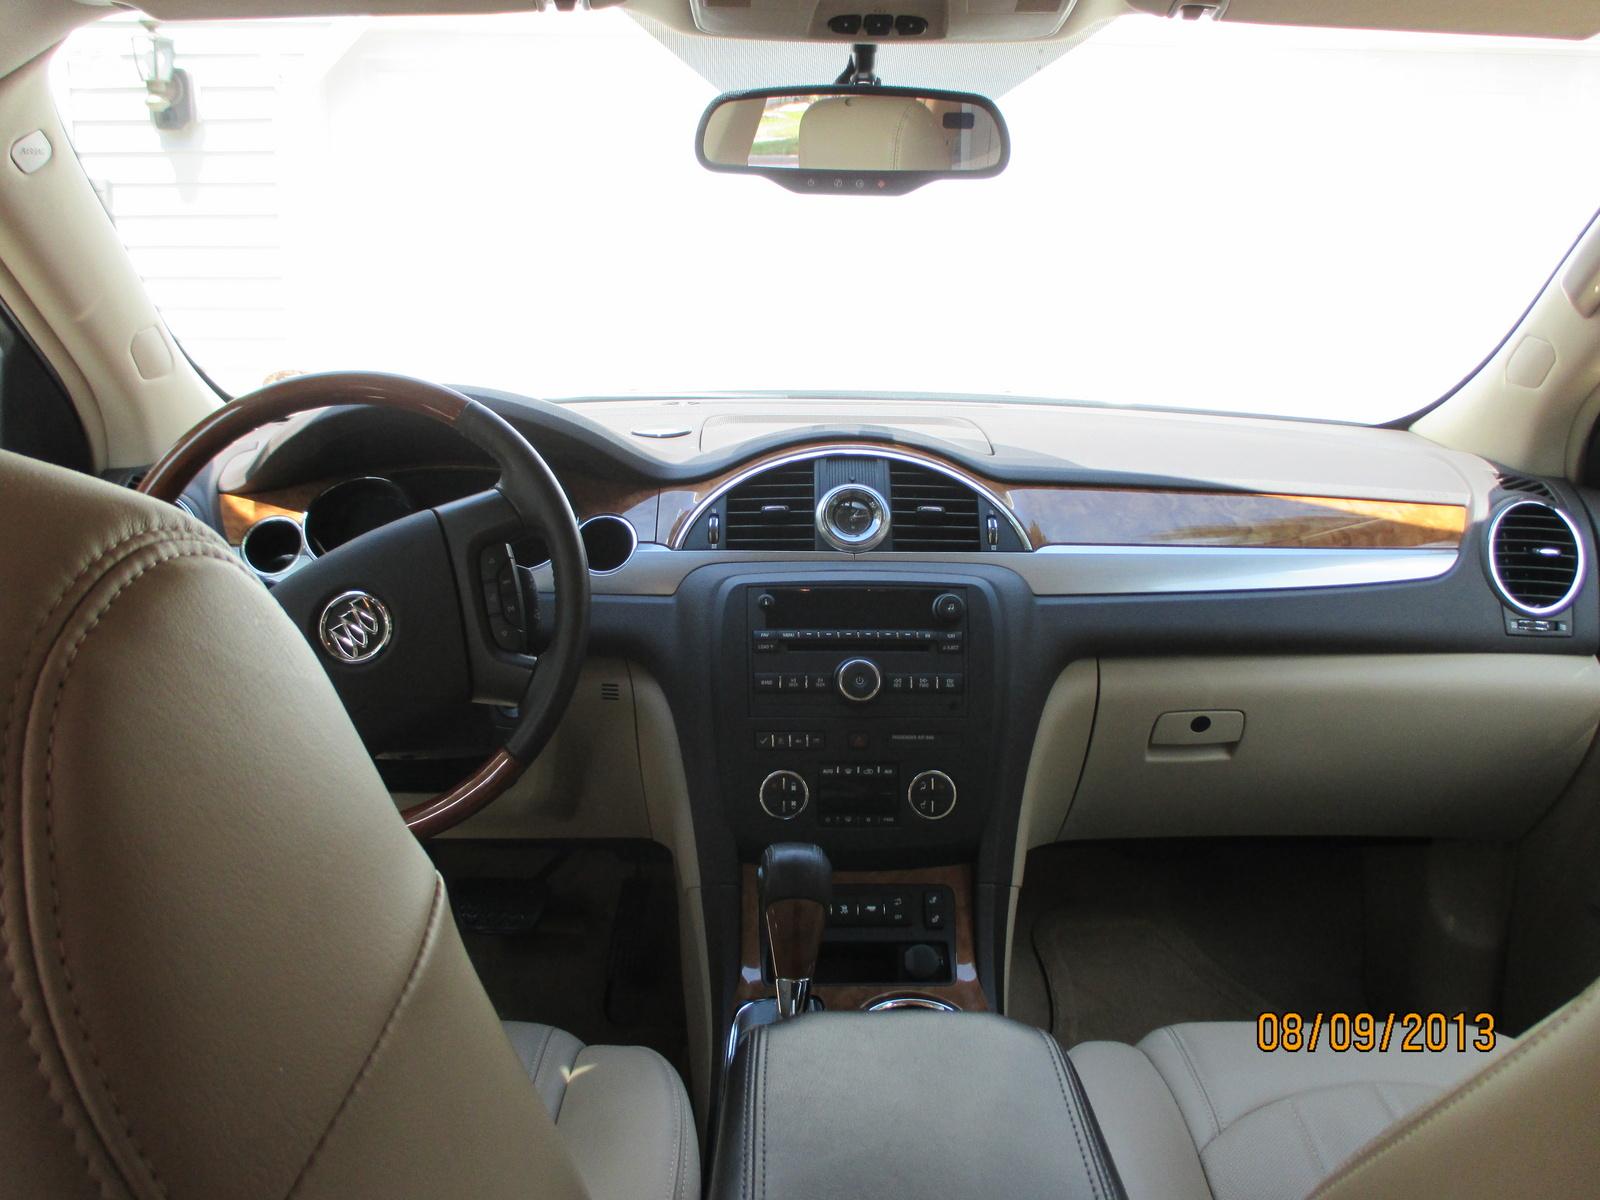 2008 Buick Enclave Pictures Cargurus